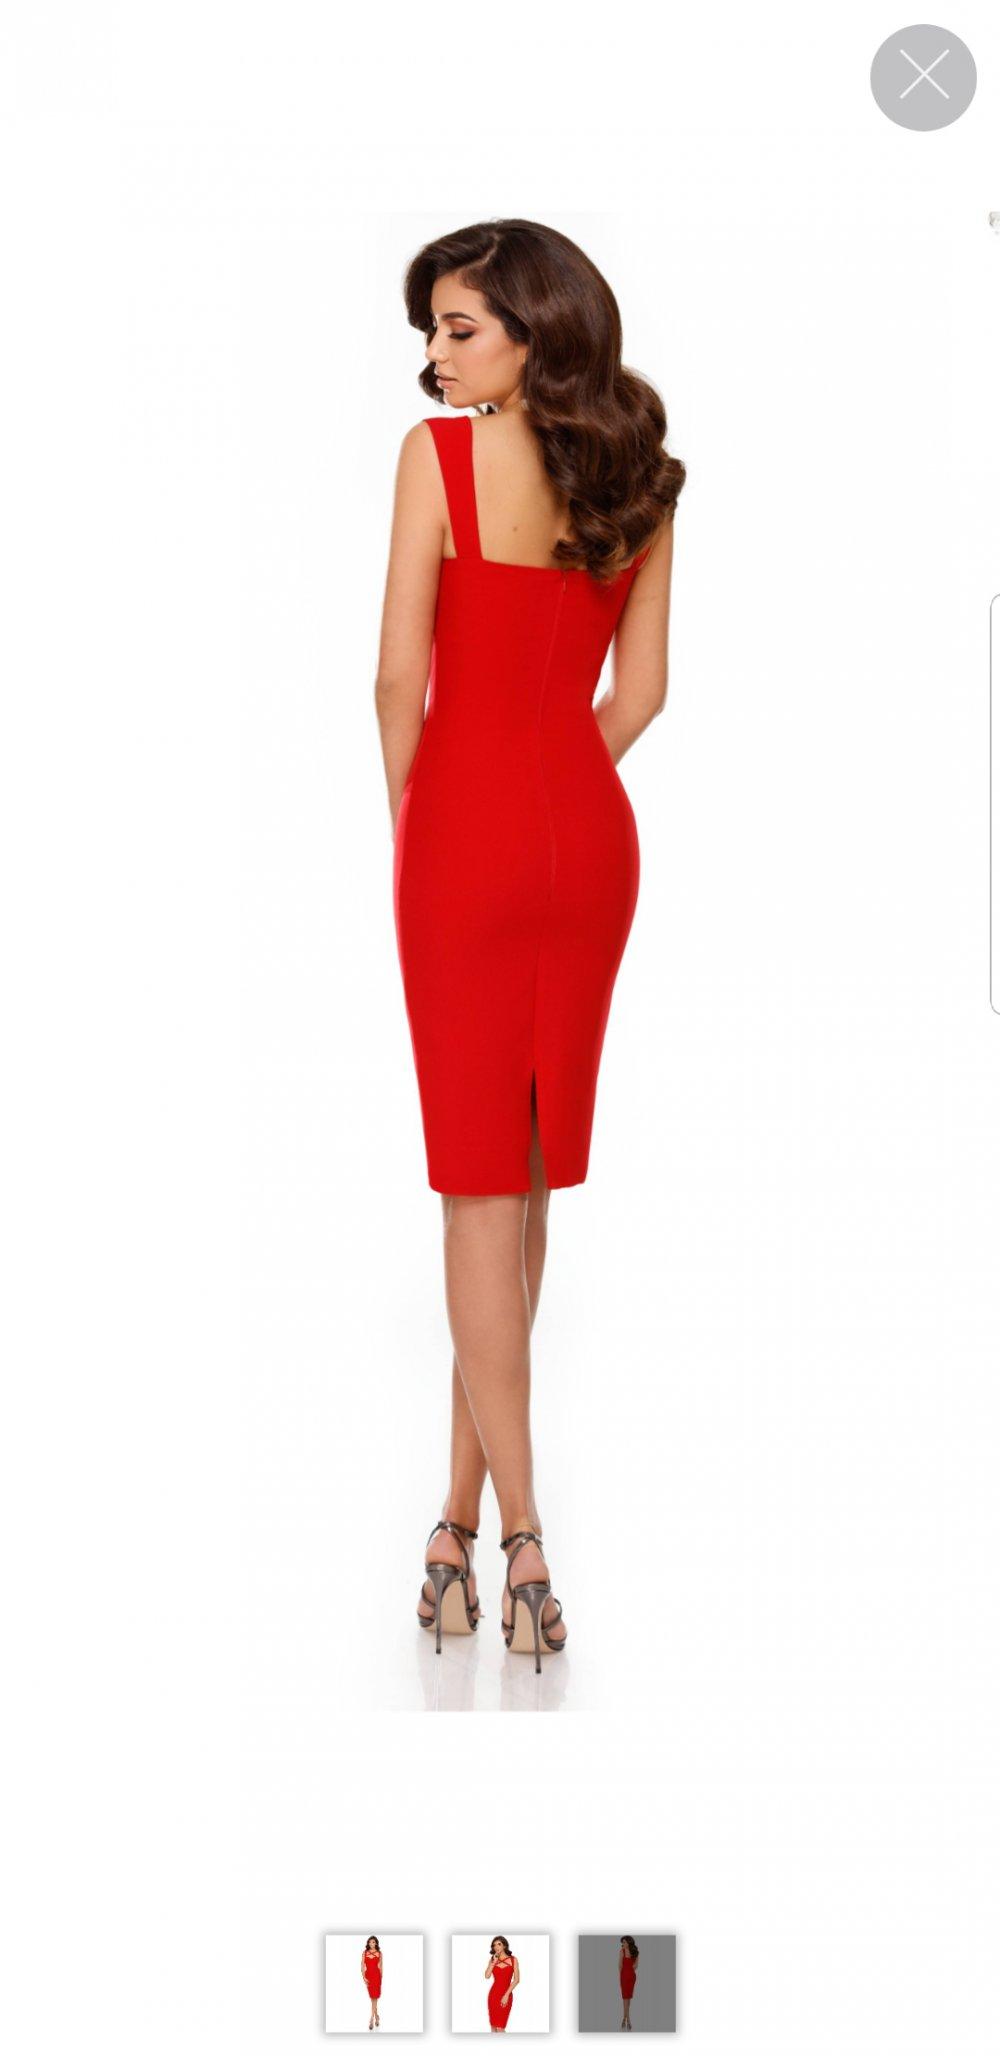 rote kleider kurz 18a18a18